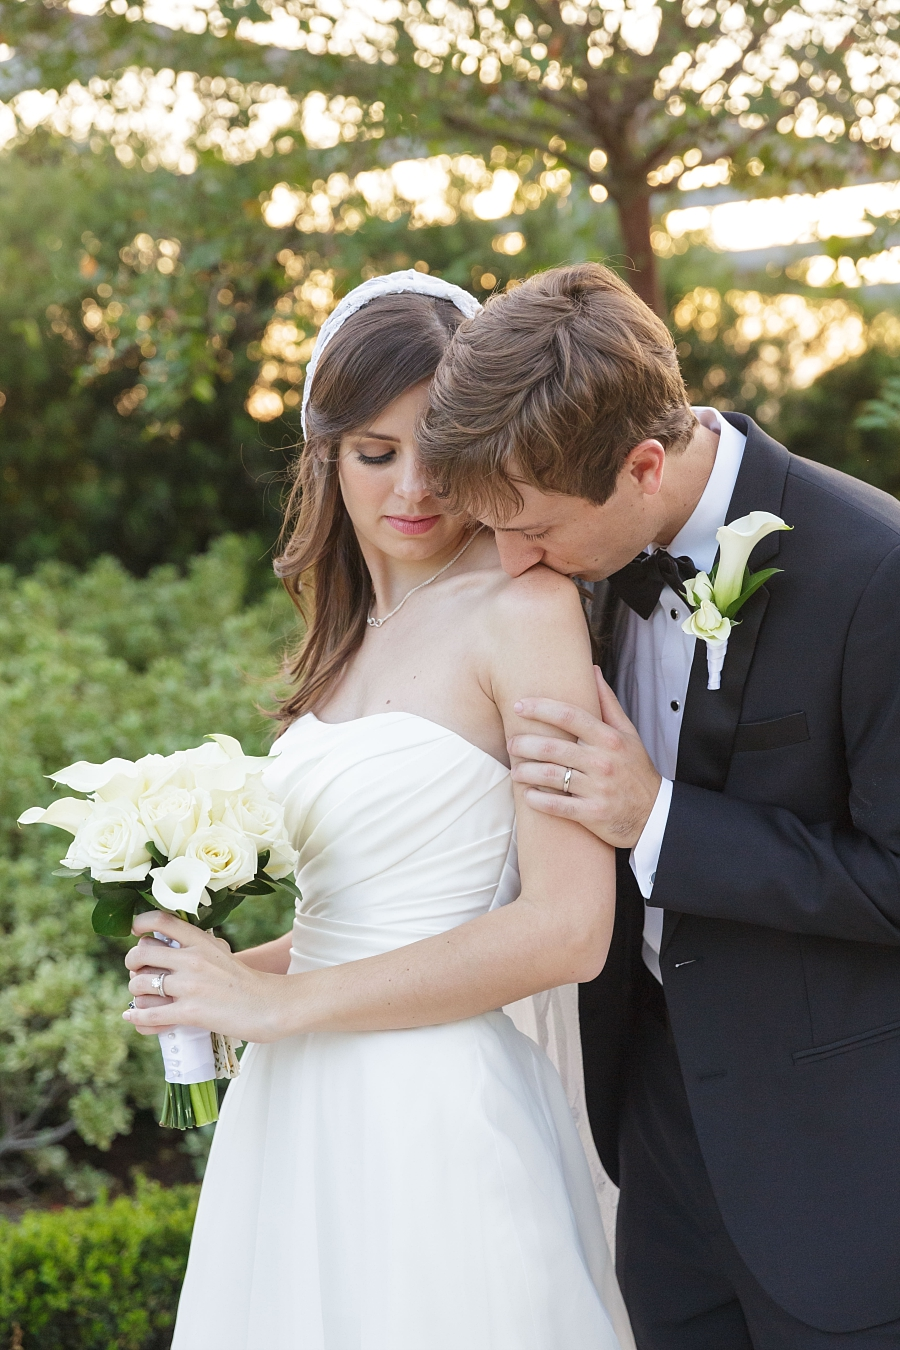 Stacy-Anderson-Photography-McGovern-Centennial-Gardens-Houston-Wedding-Photographer_0060.jpg